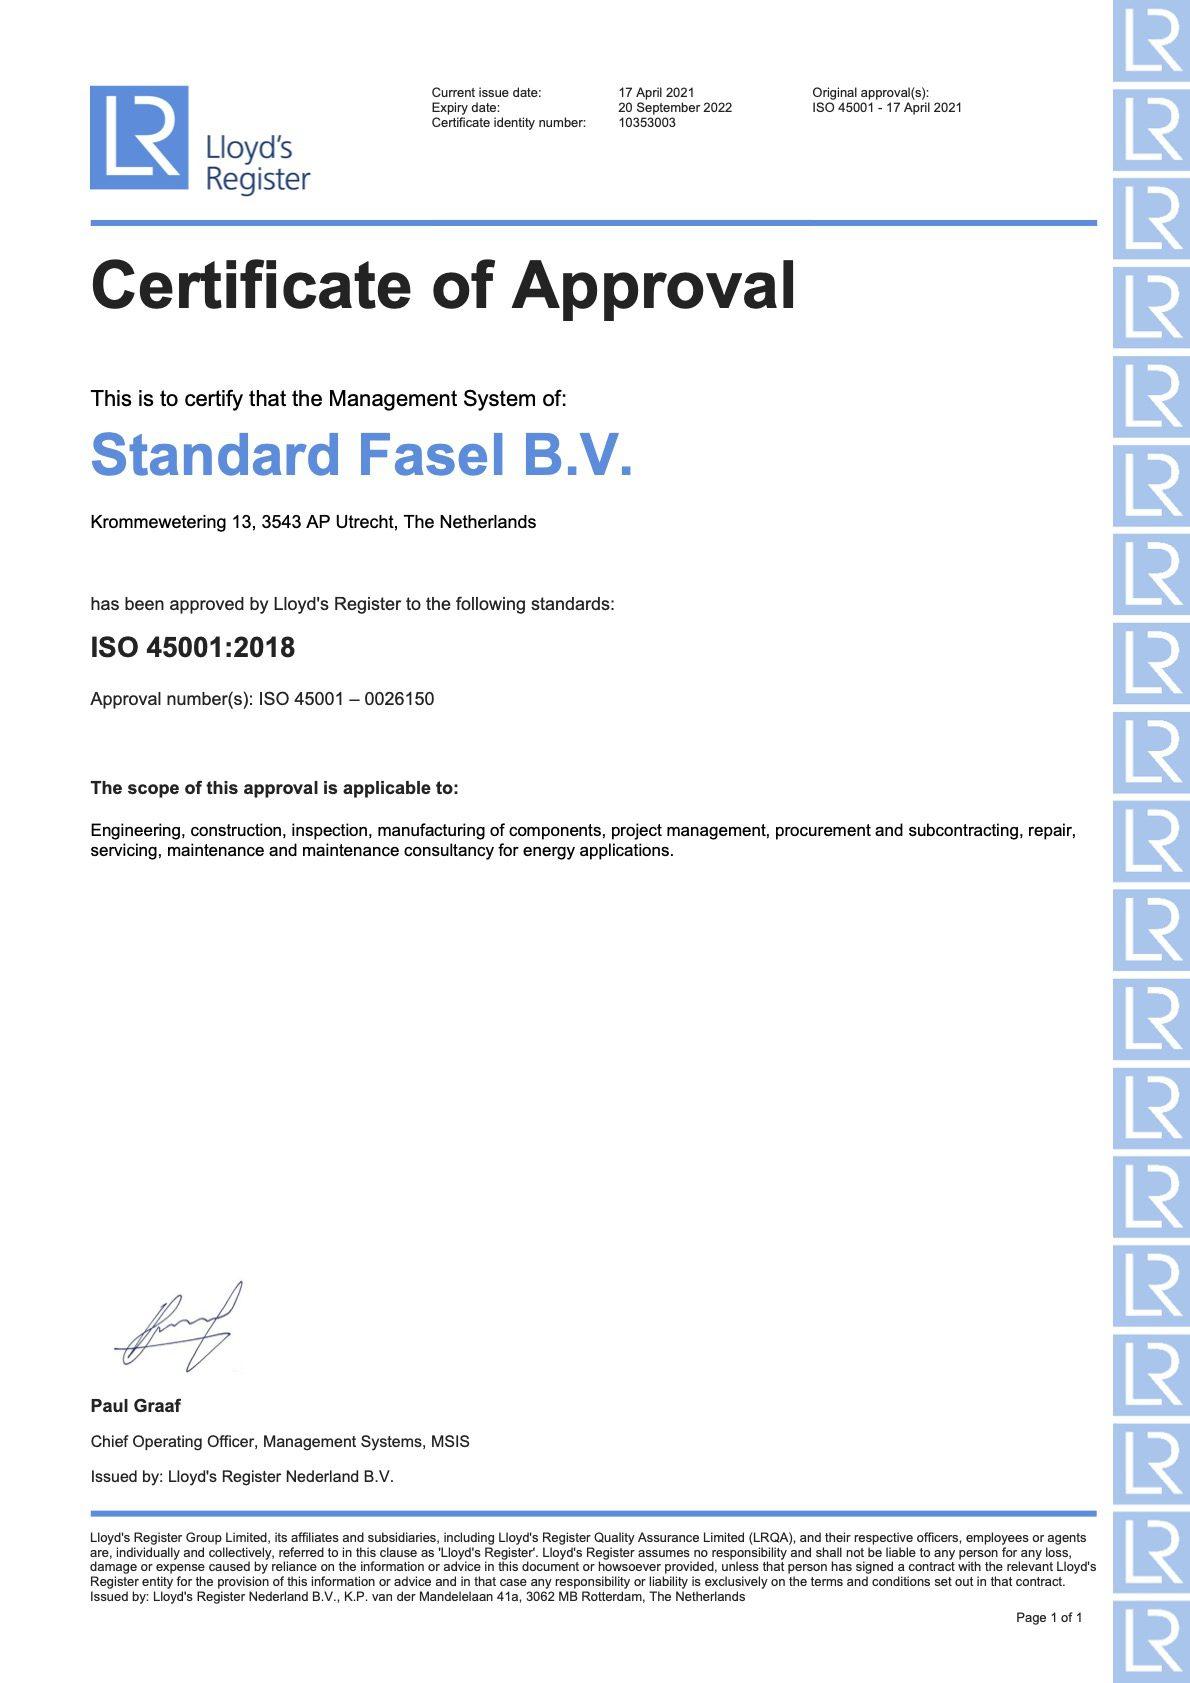 Iso 45001 certificering